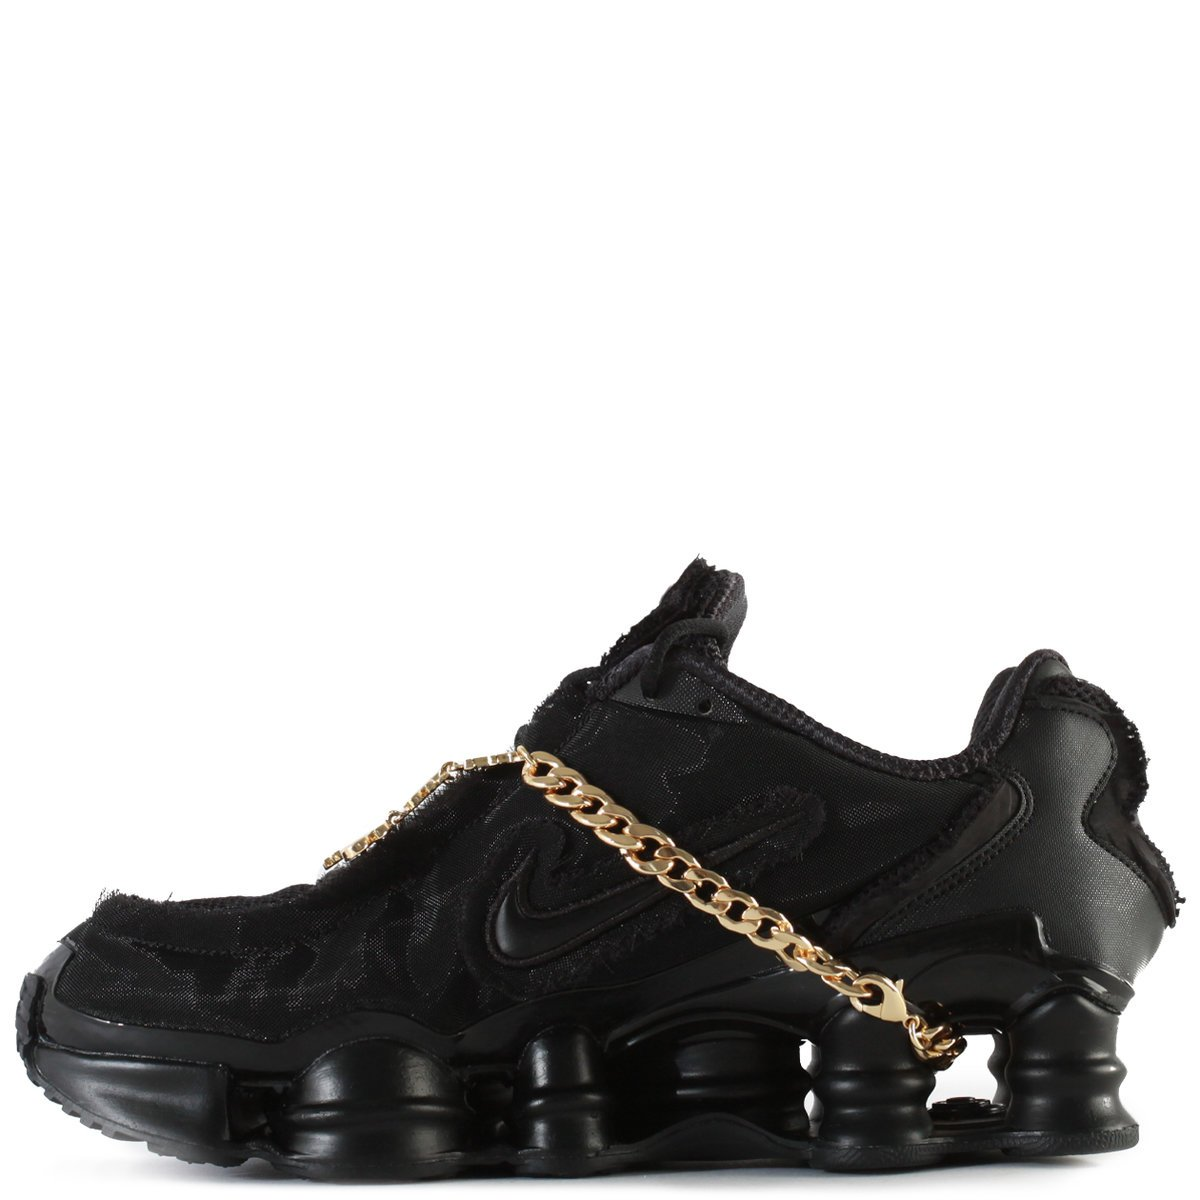 x Nike Shox TL Sneakers Black